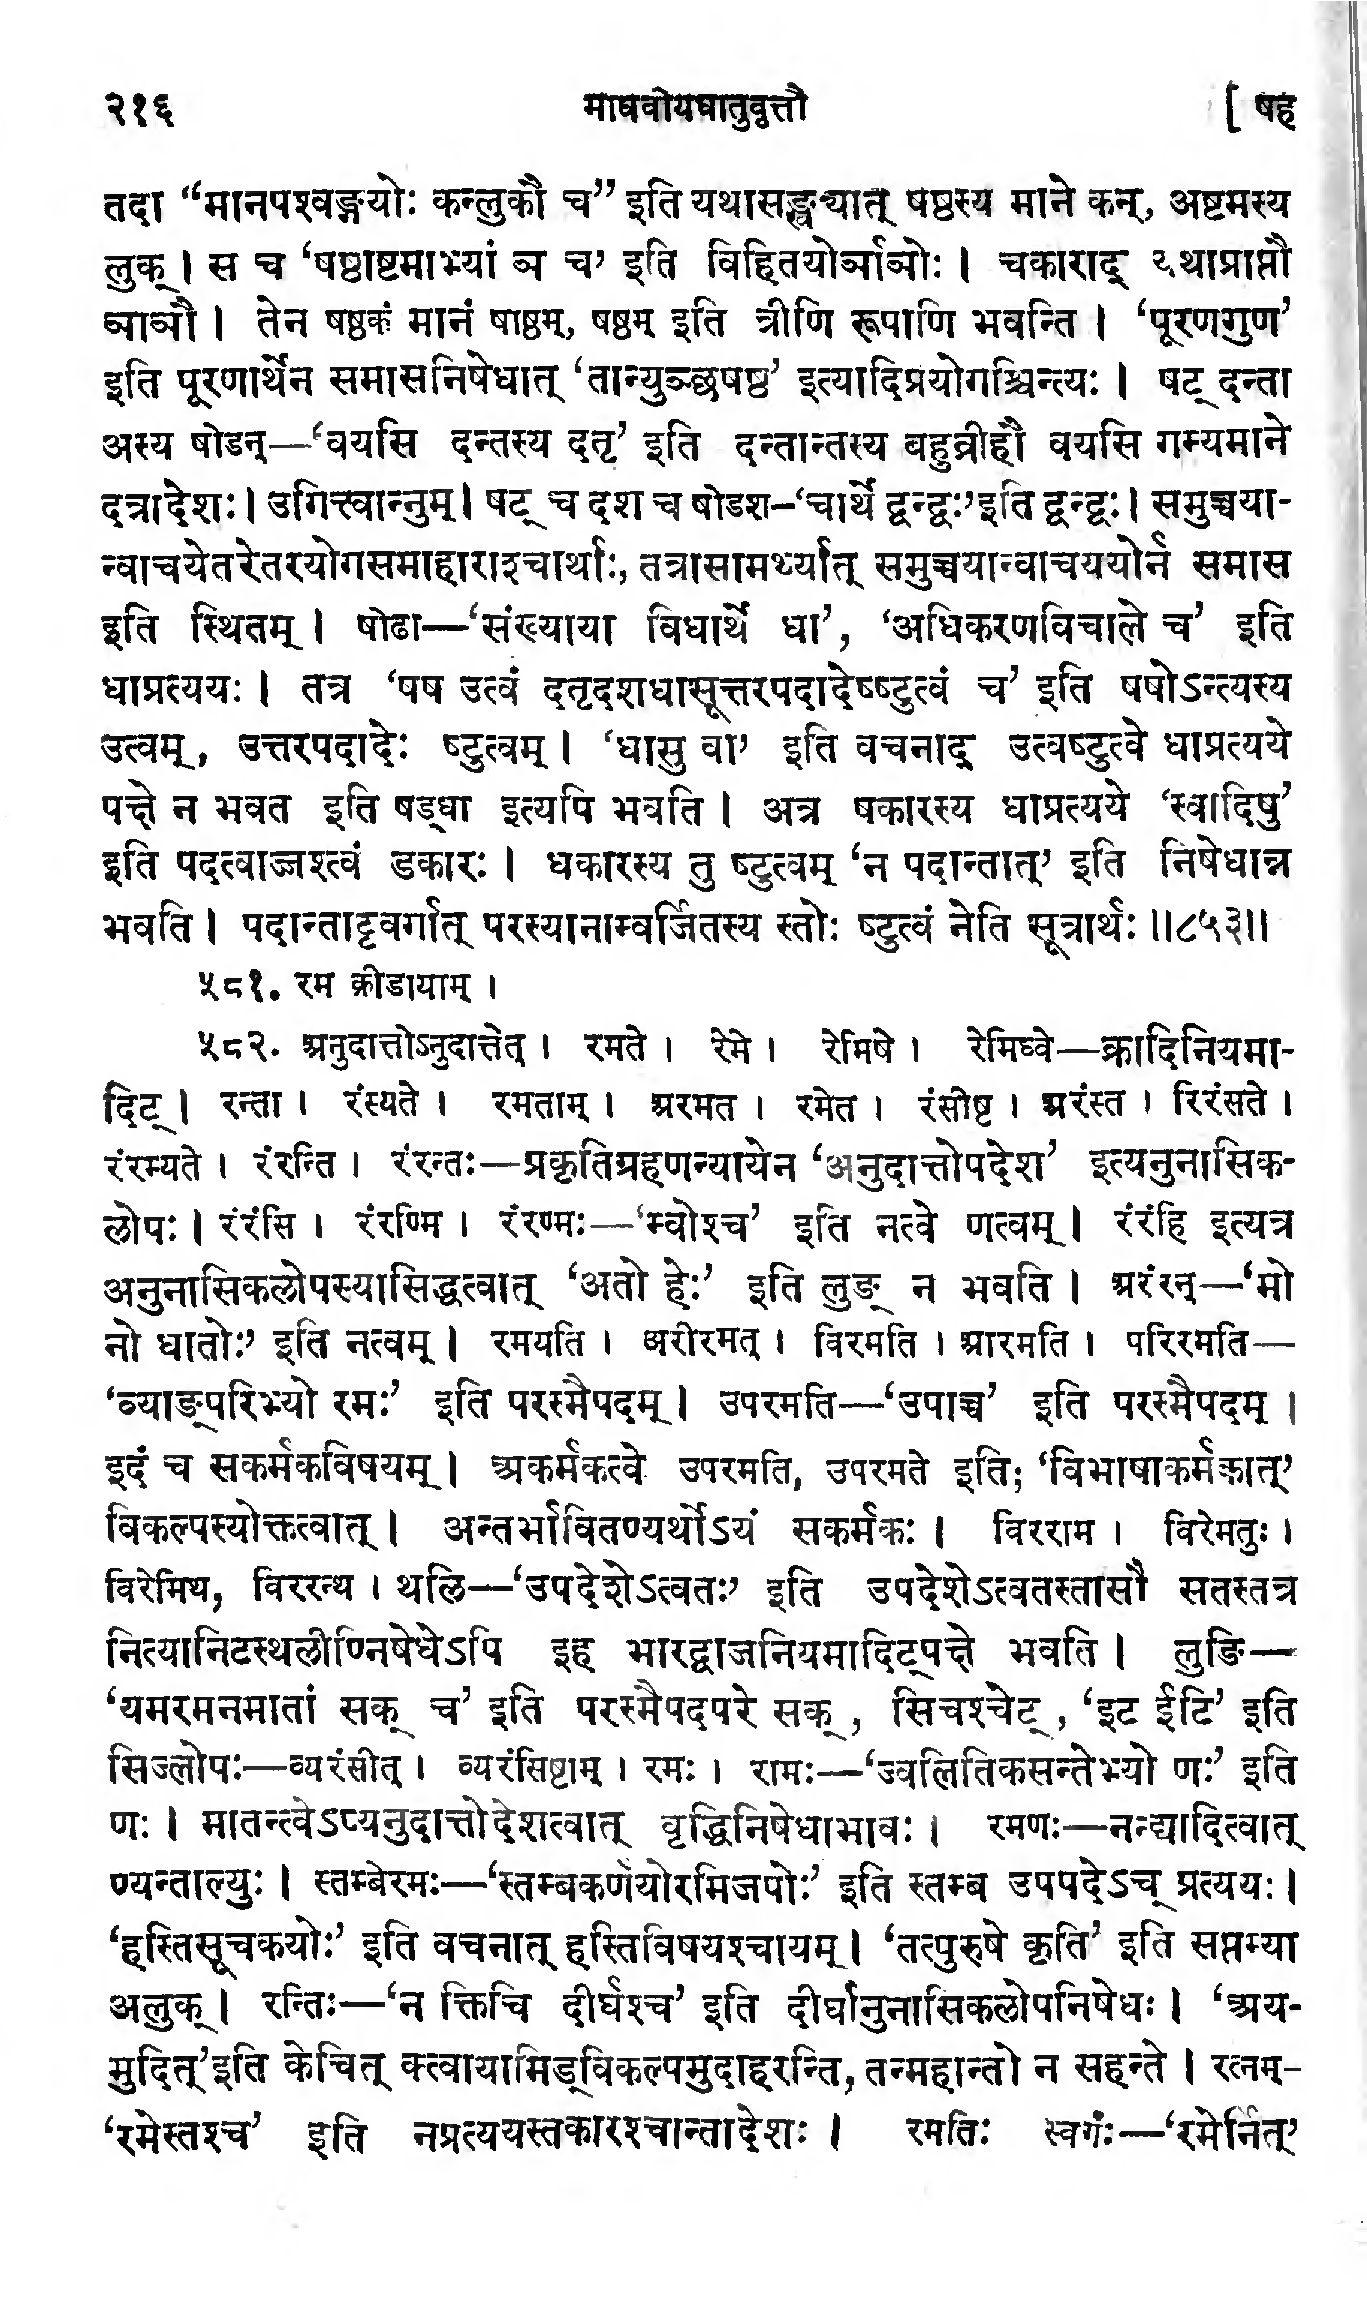 Sanskrit Dictionary